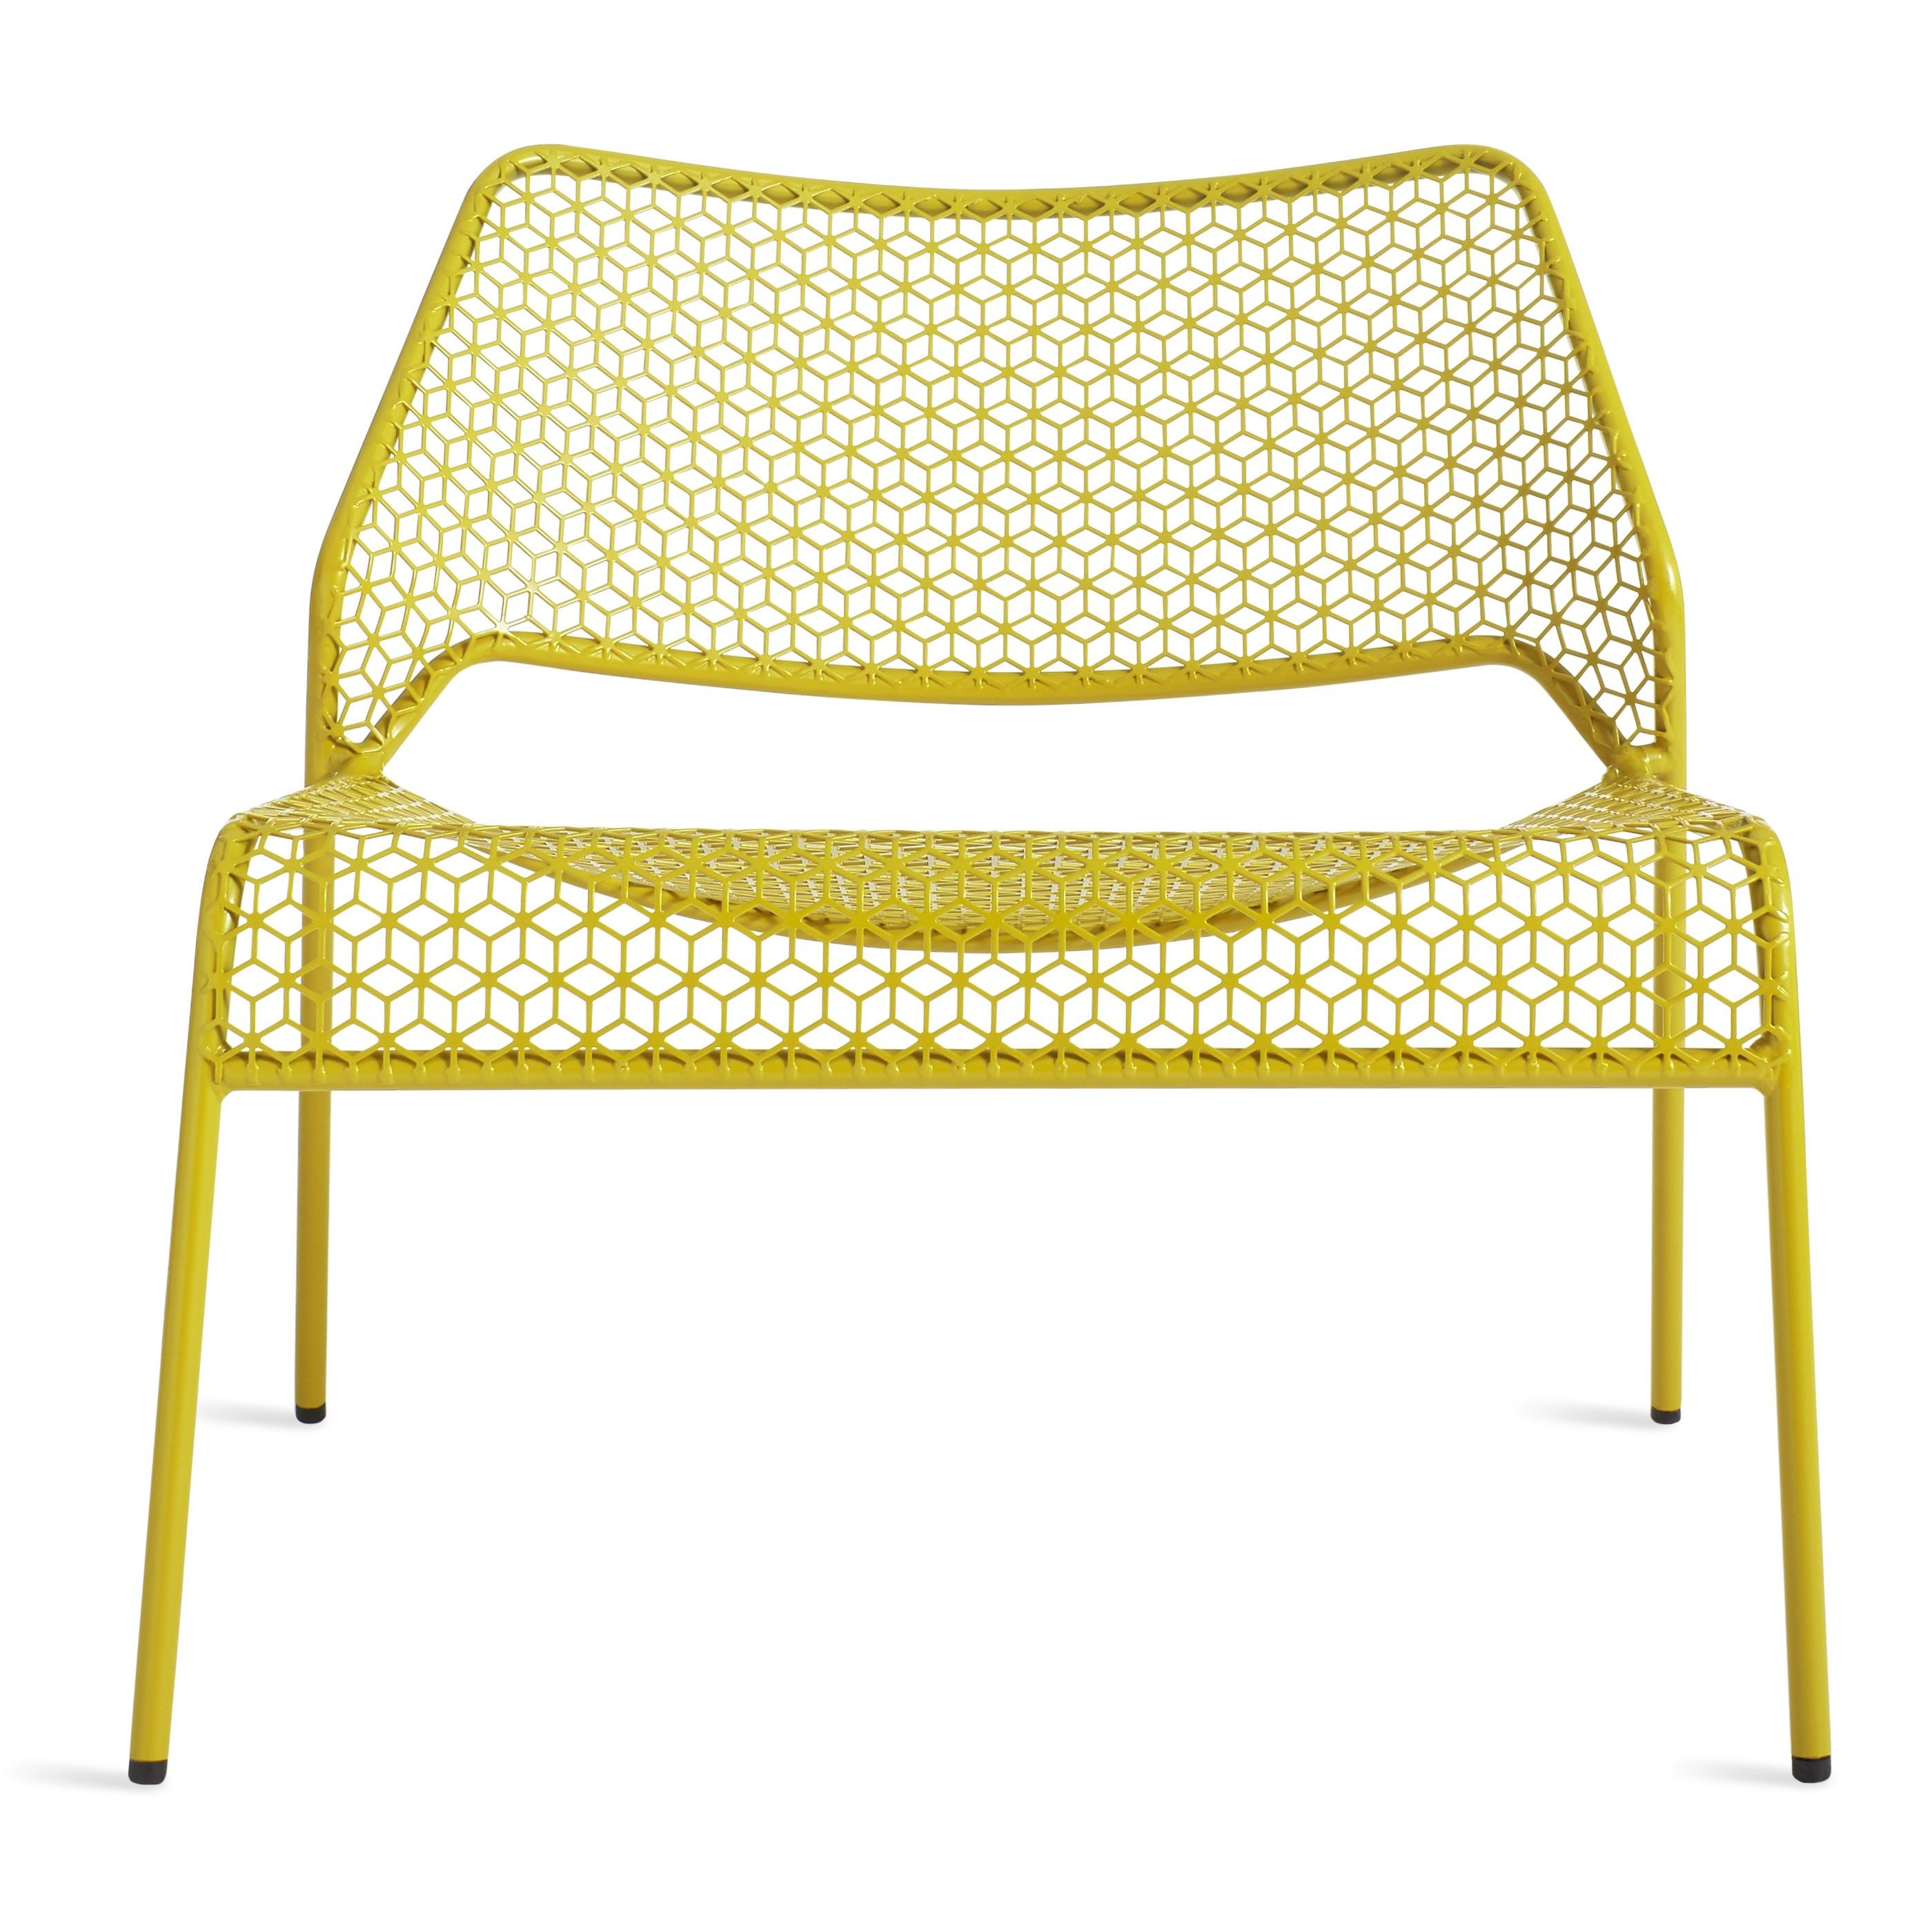 Hot Mesh Lounge Chair Metal Patio Chairs Outdoor Furniture Chairs Modern Outdoor Furniture